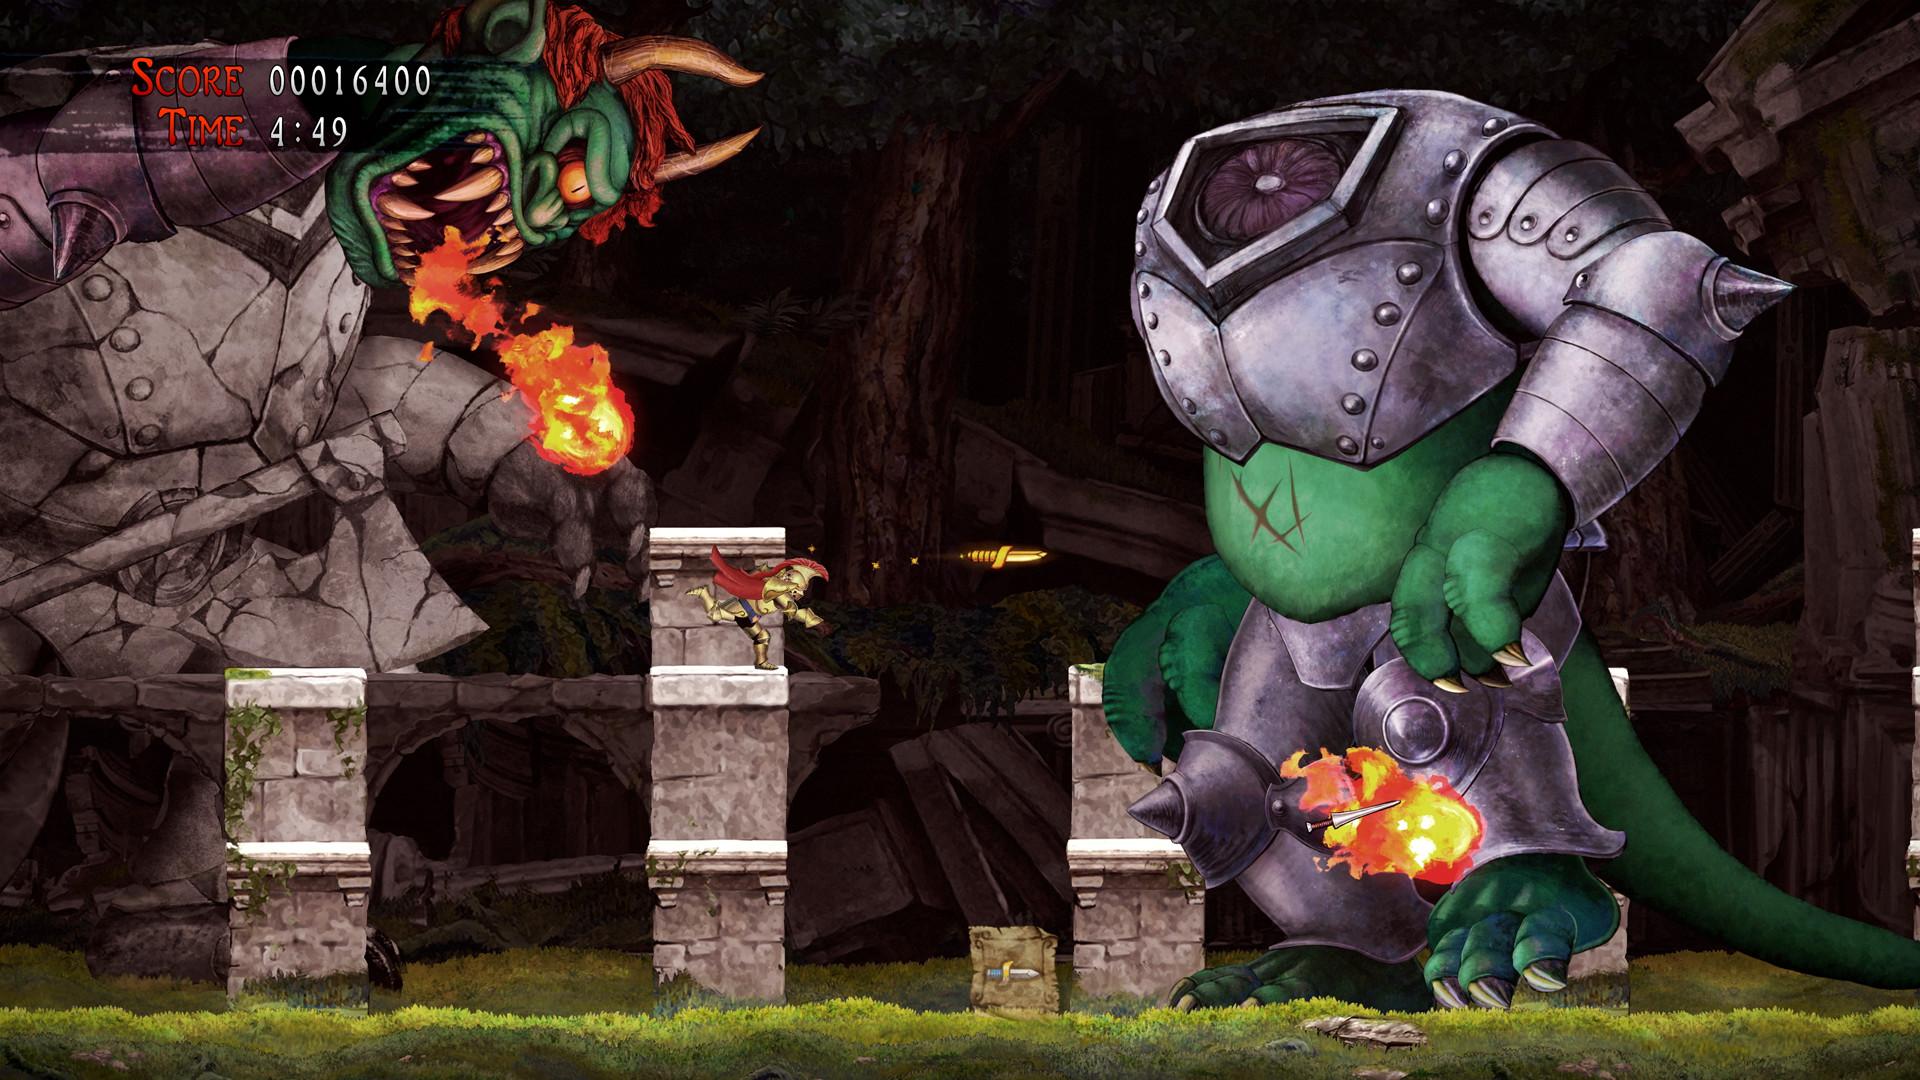 经典回归 魔界村-重制版/Ghosts n Goblins Resurrection(Build.6580247+预约特典)插图6